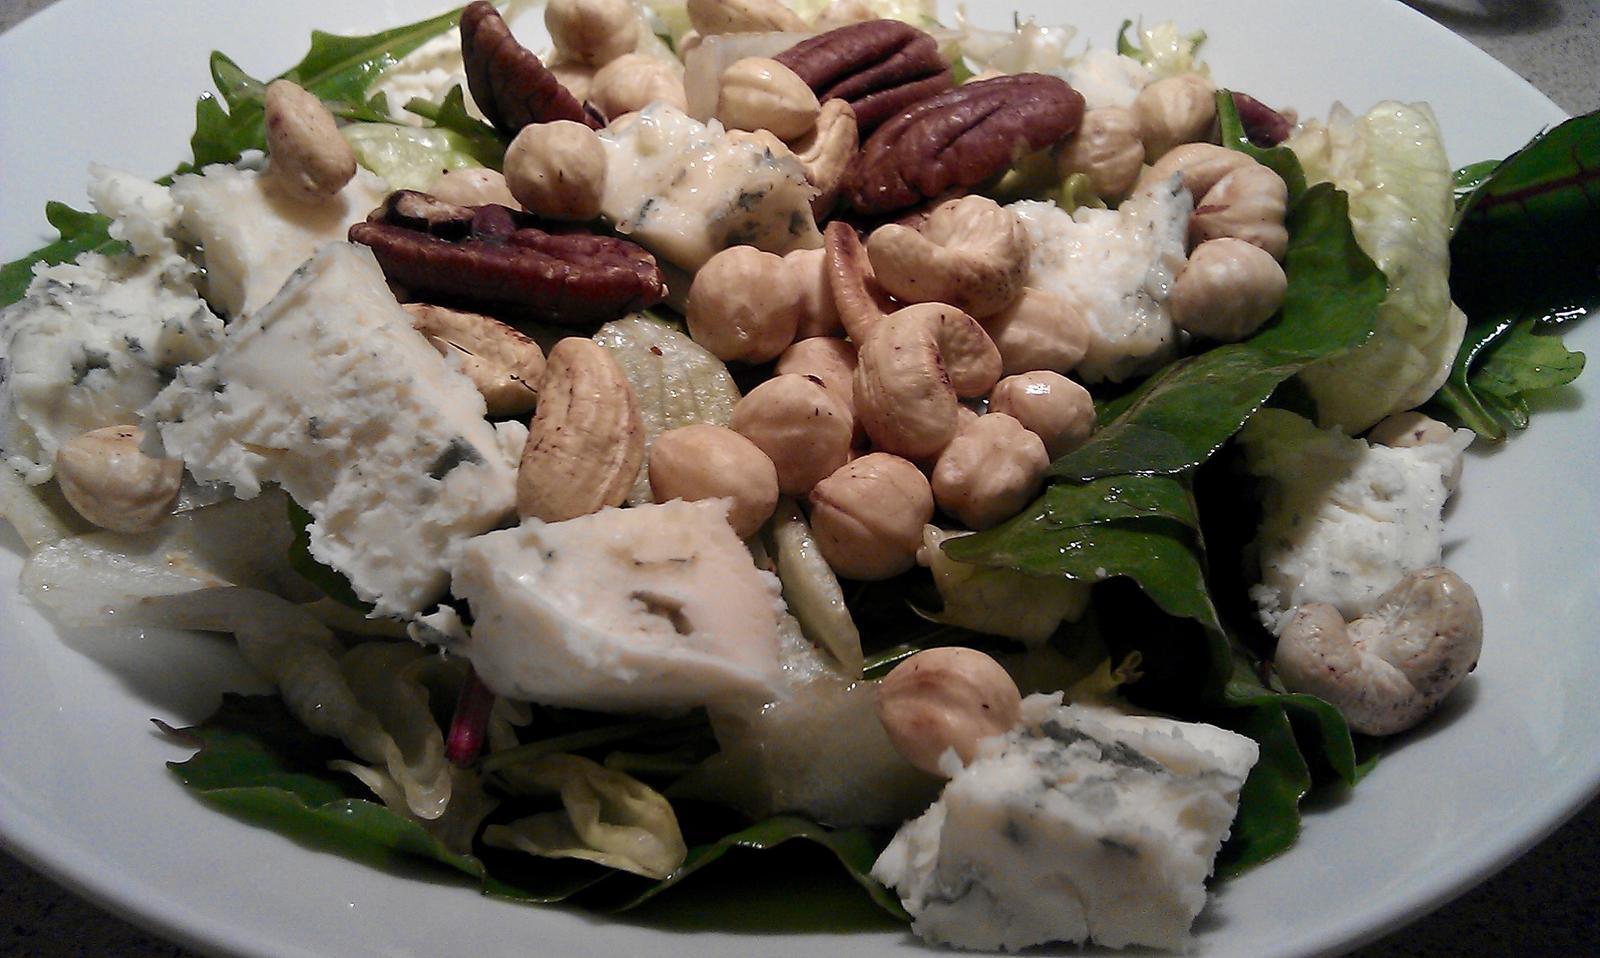 A občas i vařím... - Směs listových salátů, gorgonzola, opražené kešu, lískové a pekanové ořechy, olivový olej, aceto balsamico